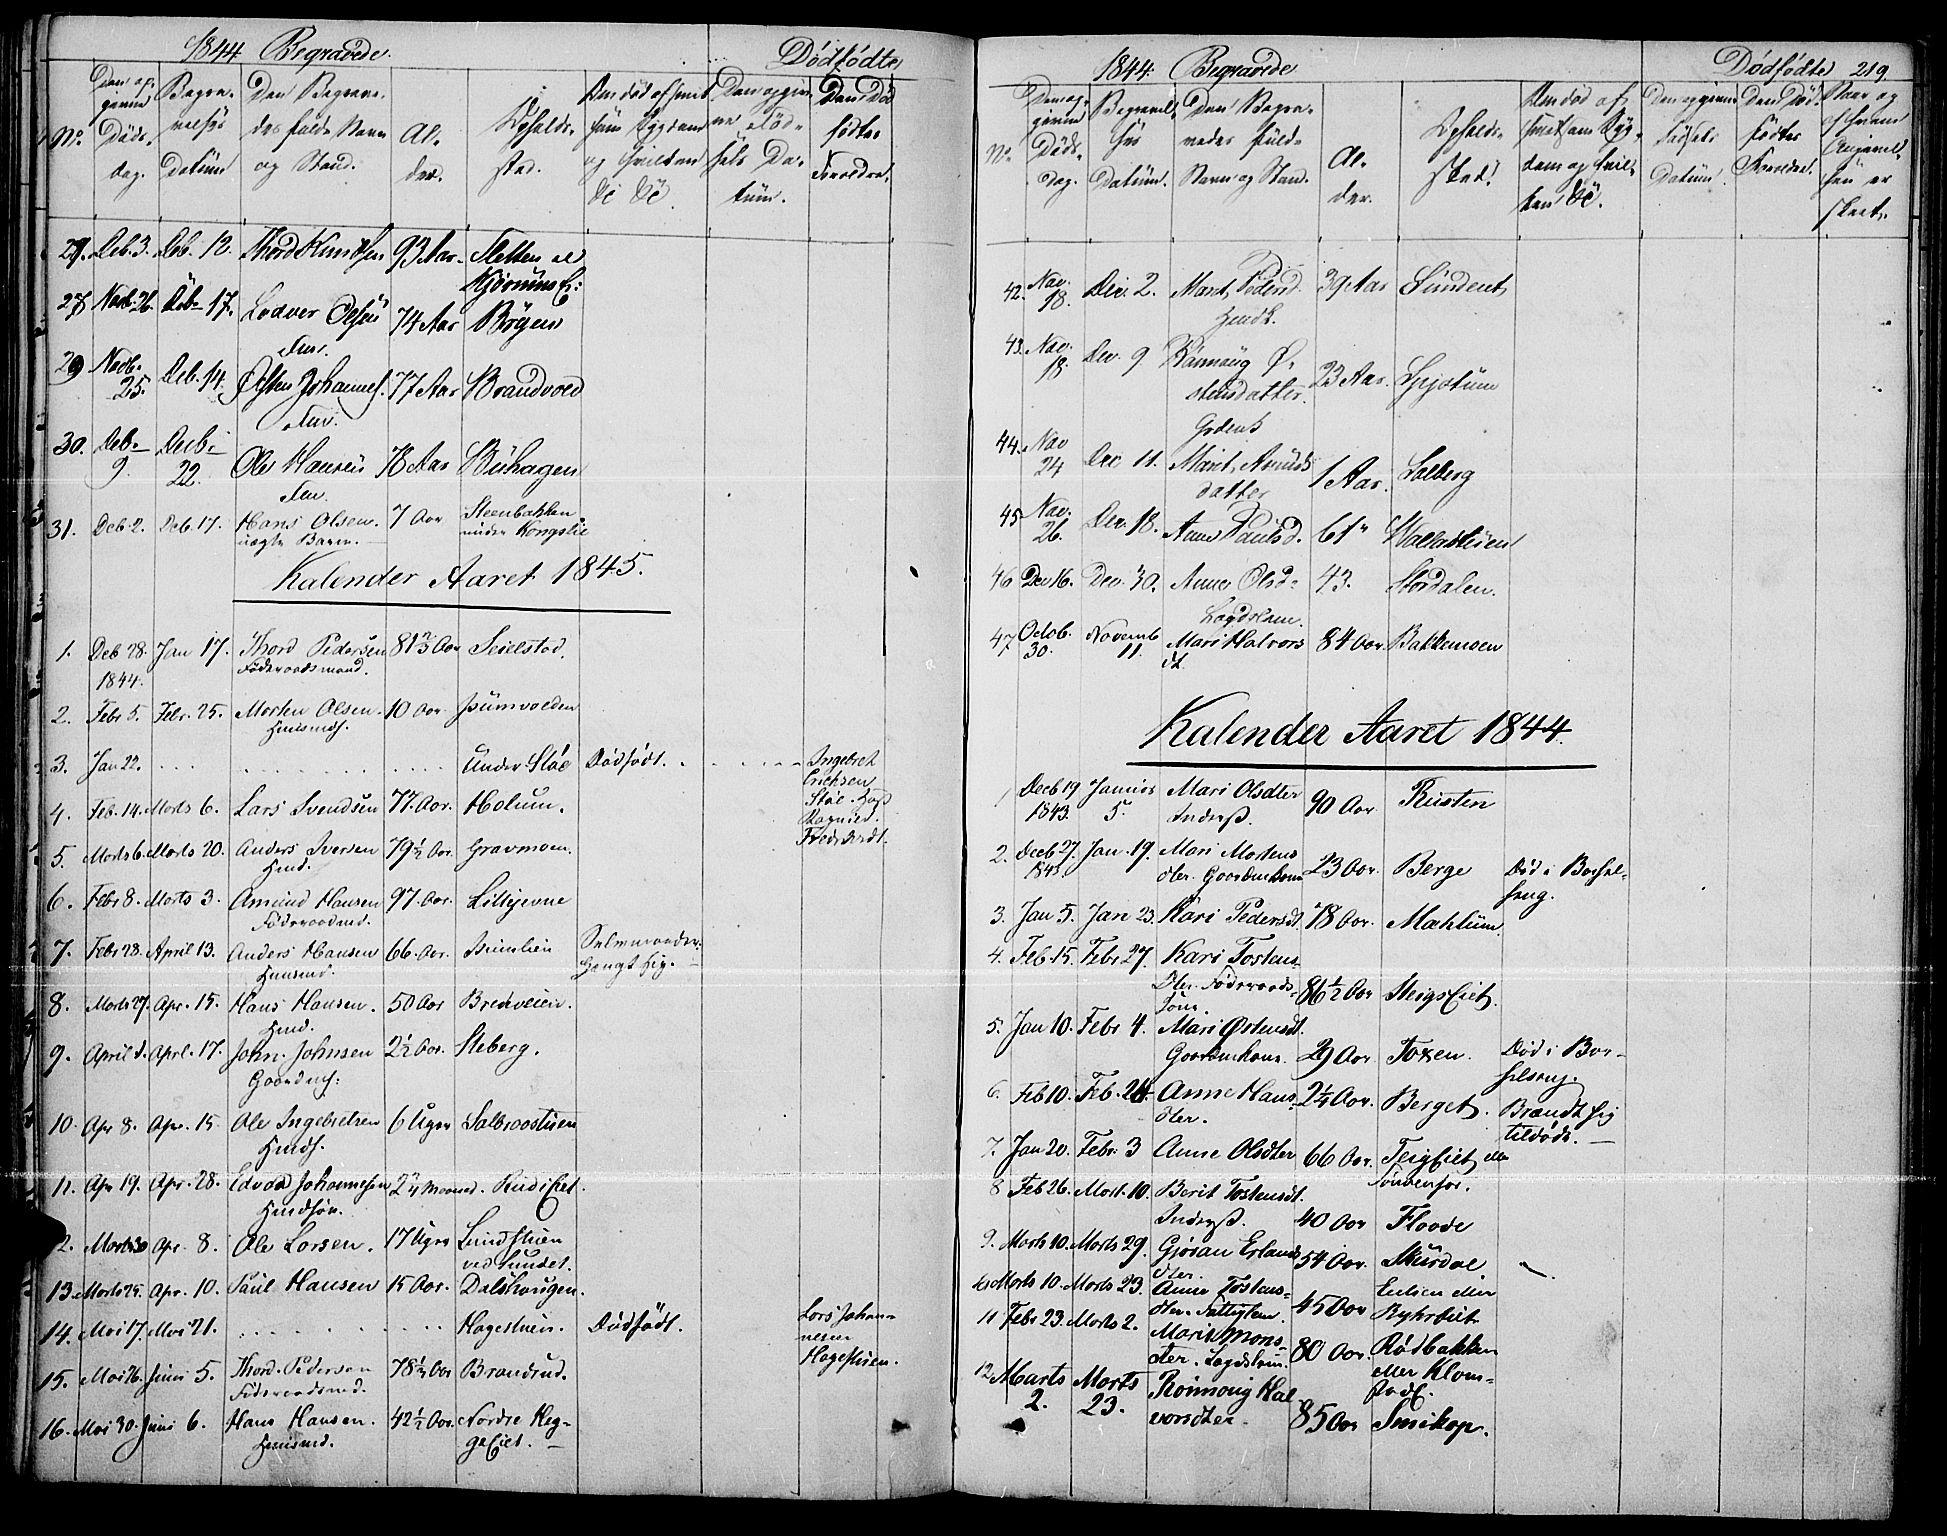 SAH, Fron prestekontor, H/Ha/Haa/L0004: Ministerialbok nr. 4, 1839-1848, s. 219